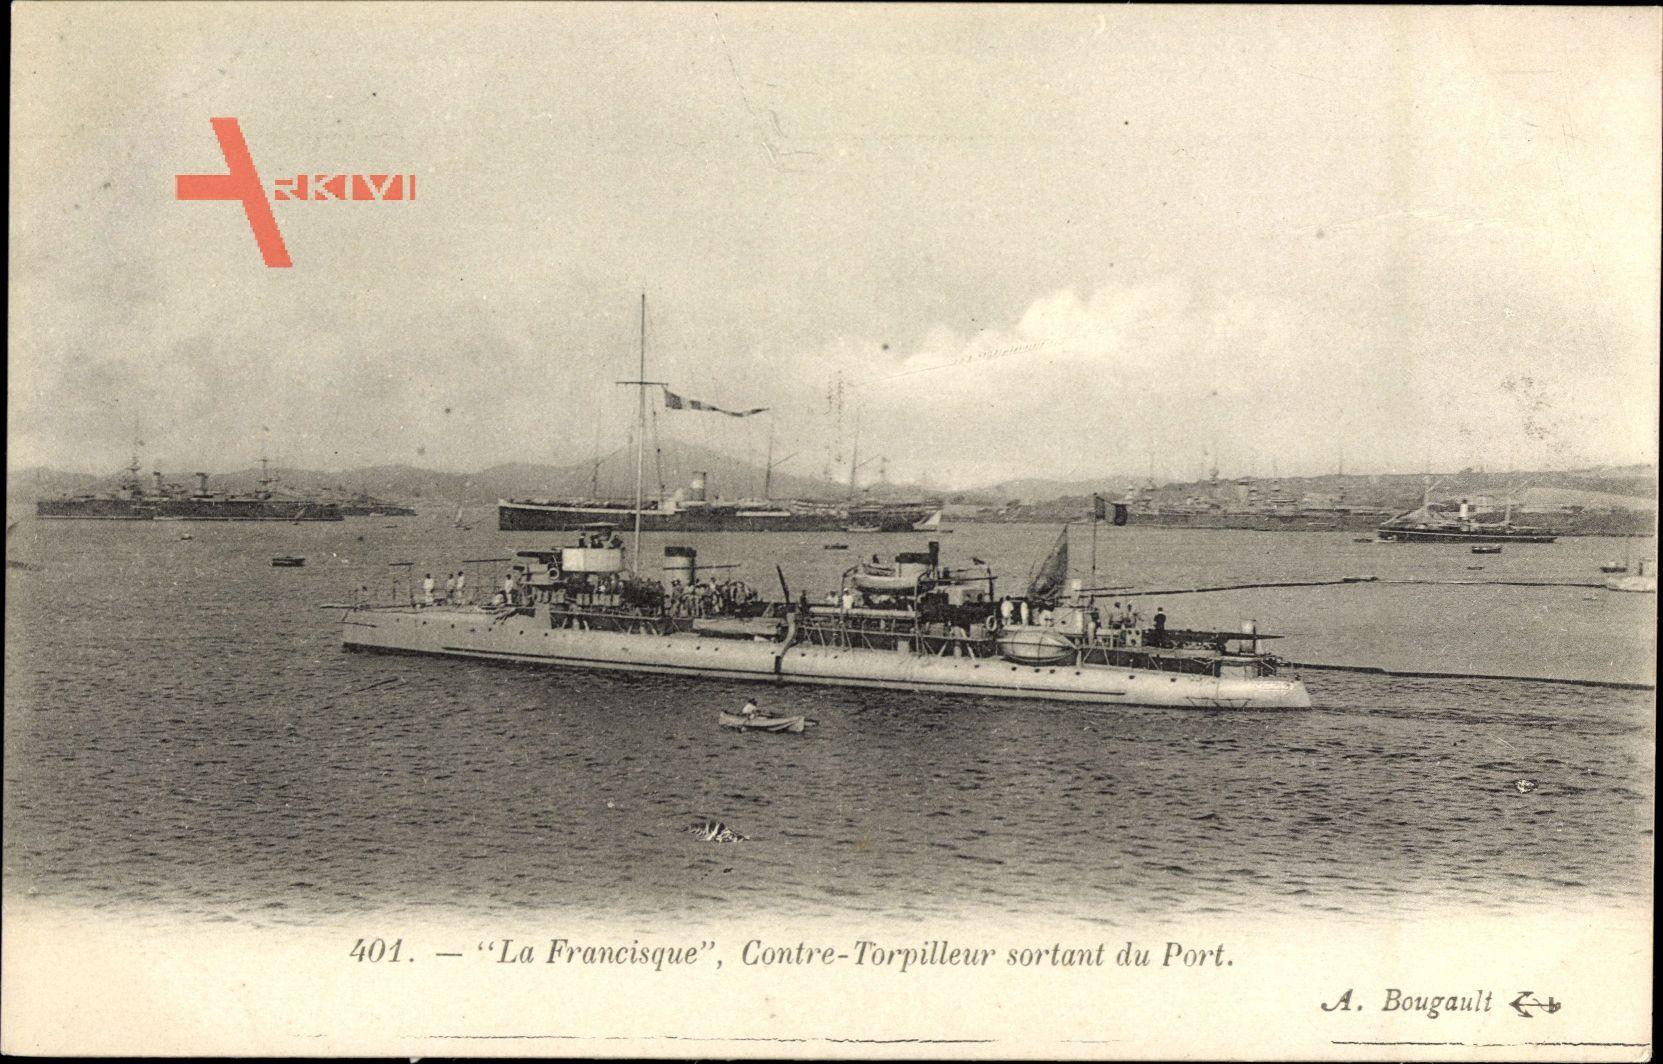 Französisches Kriegsschiff, Francisque, Contre Torpilleur sortant du Port